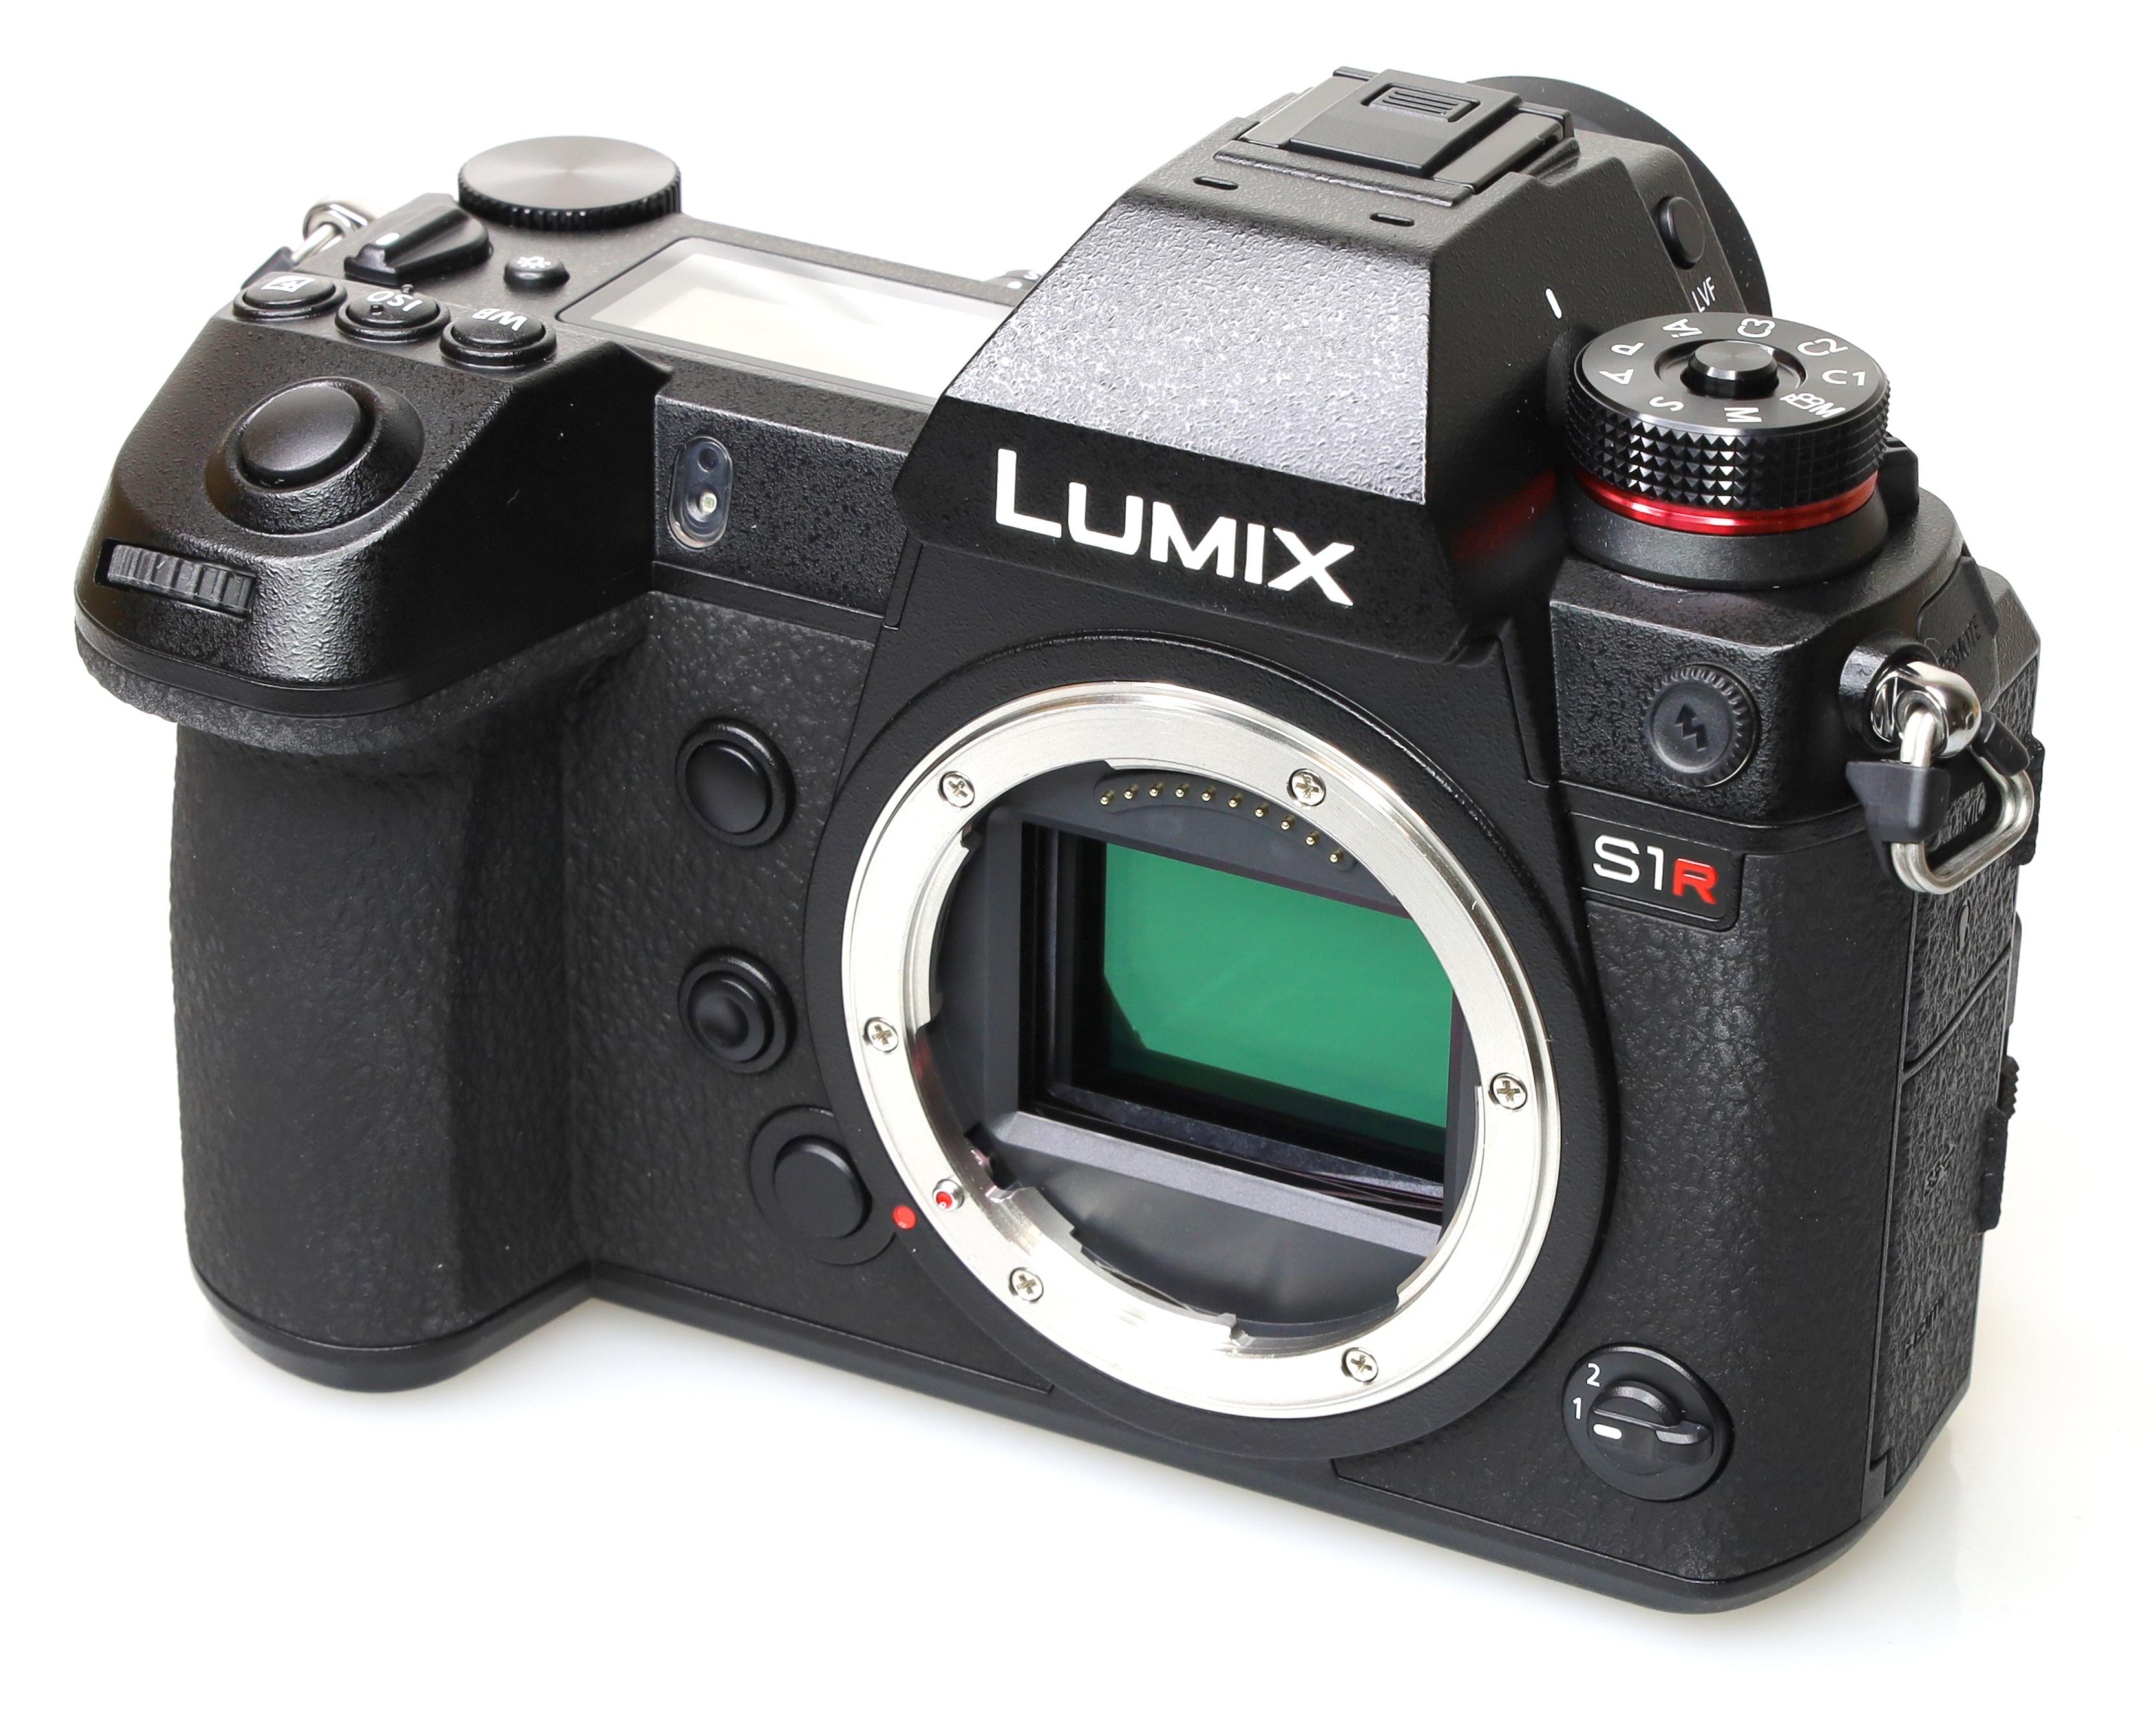 Panasonic Lumix S1R Review | ePHOTOzine